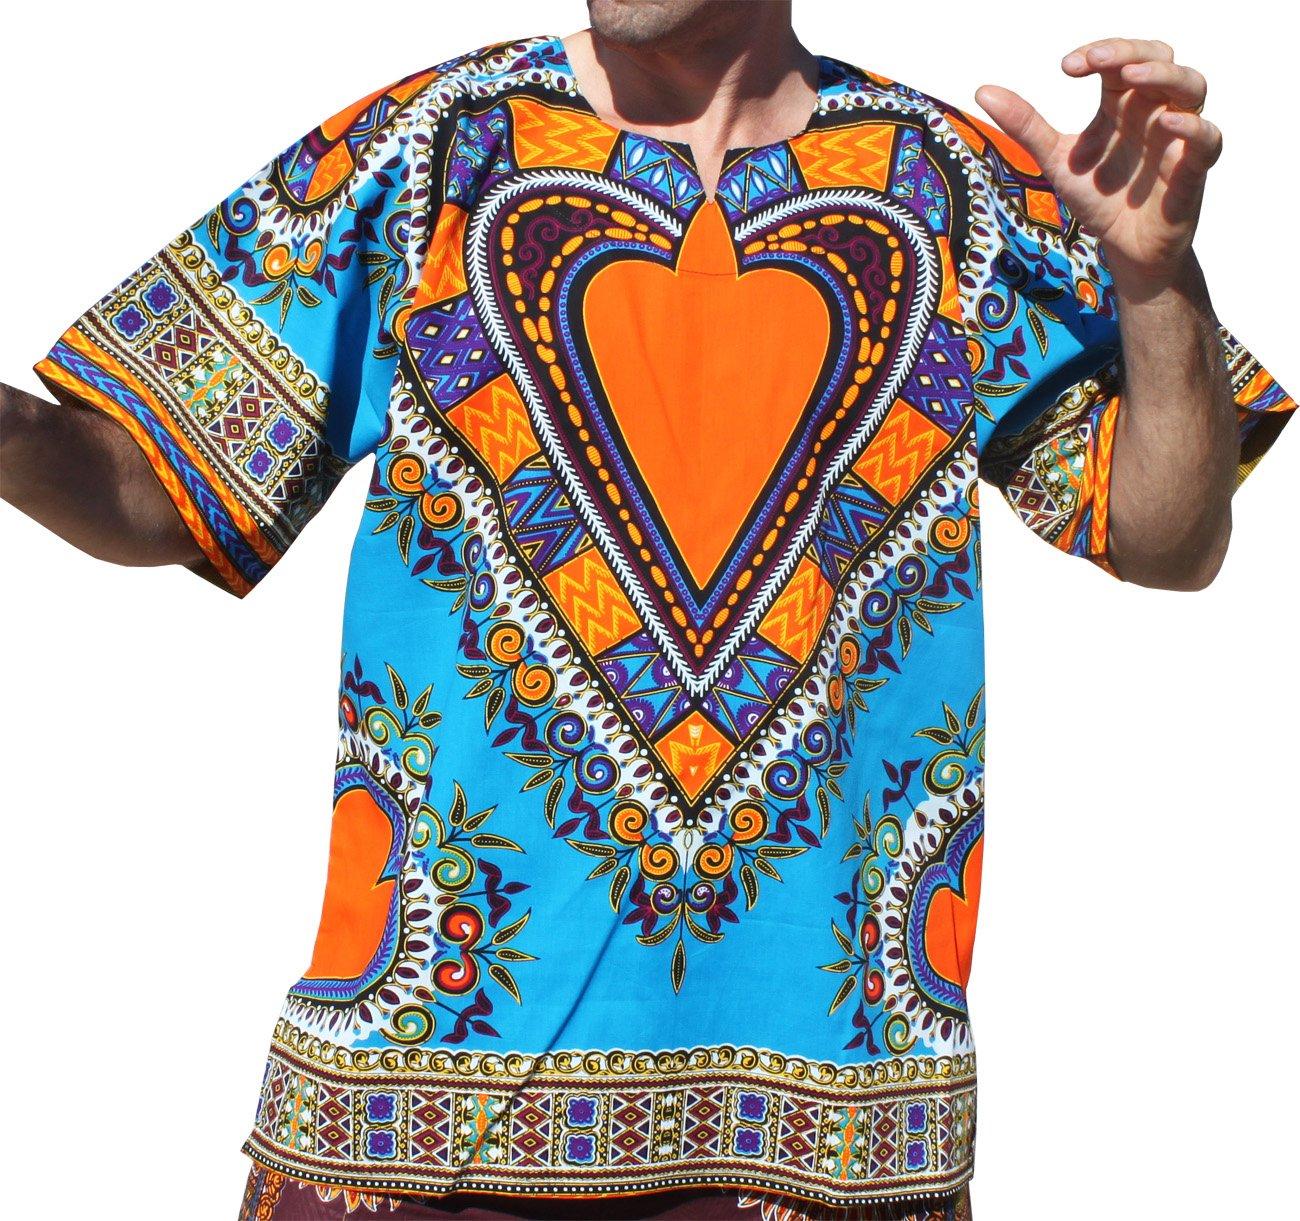 RaanPahMuang Bright Heart Cotton Africa Dashiki Plus Sized Shirt Plain Front, XXX-Large, Sky Blue by RaanPahMuang